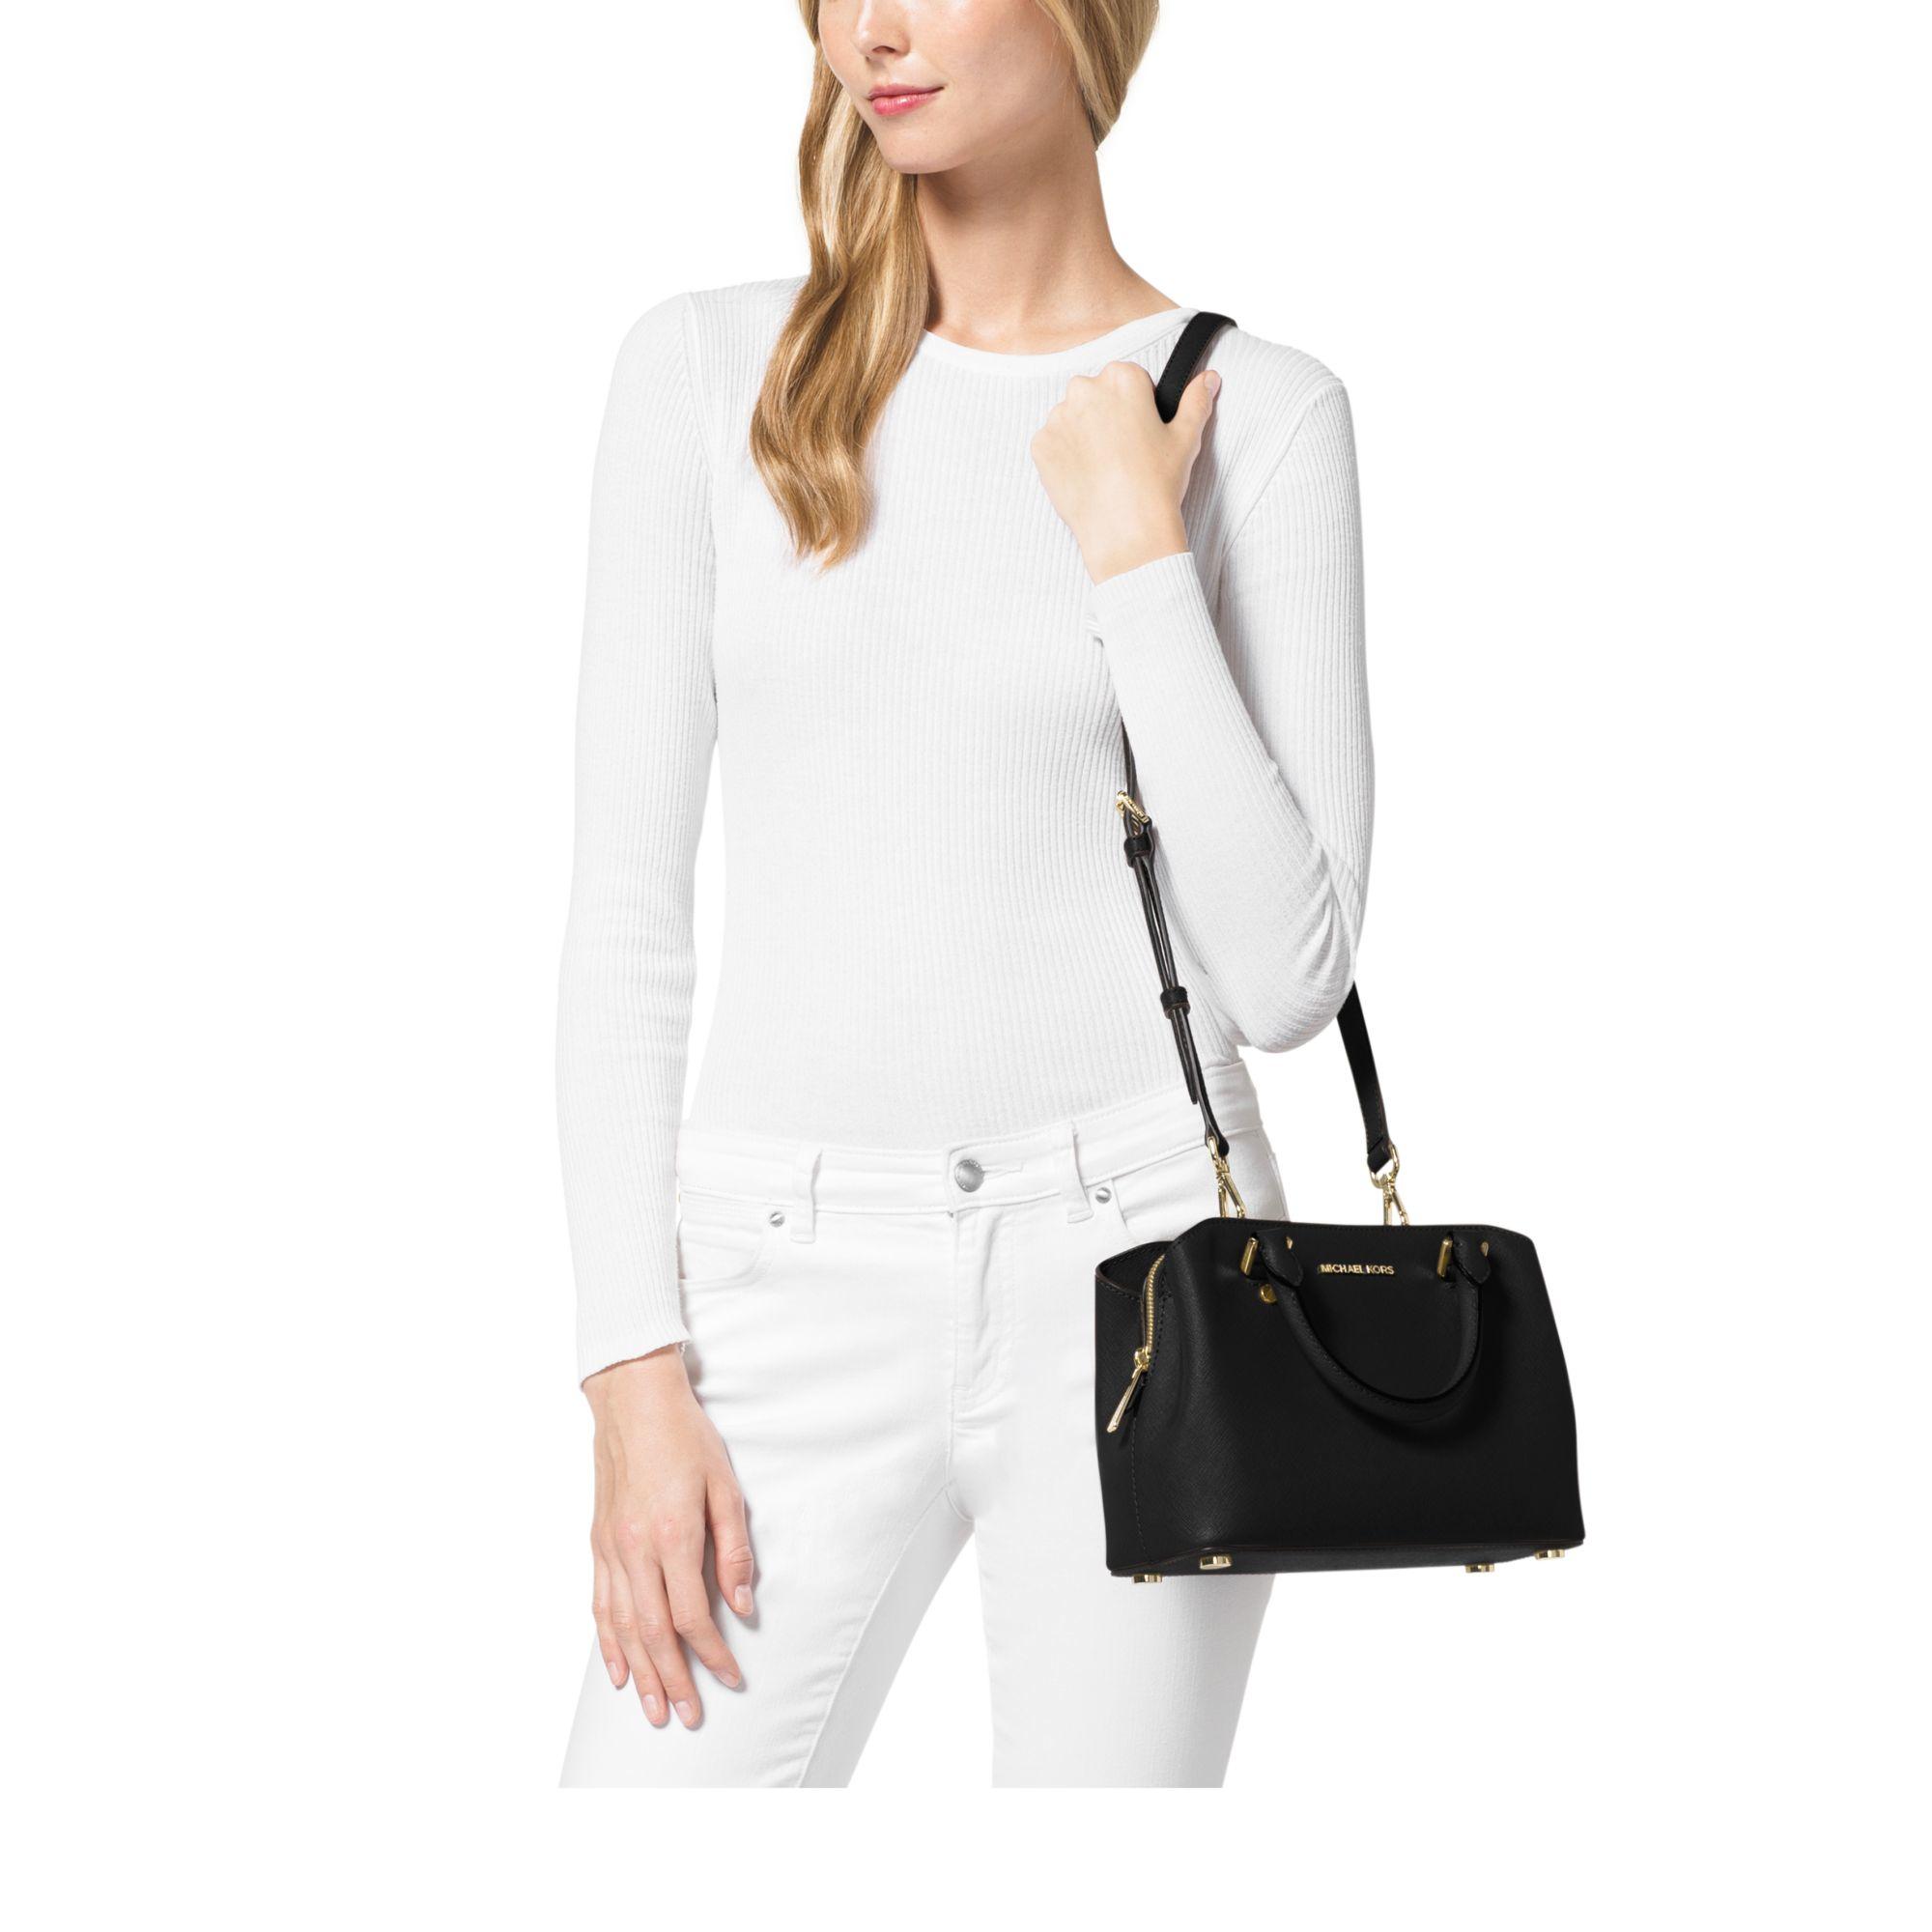 Lyst Michael Kors Savannah Small Saffiano Leather